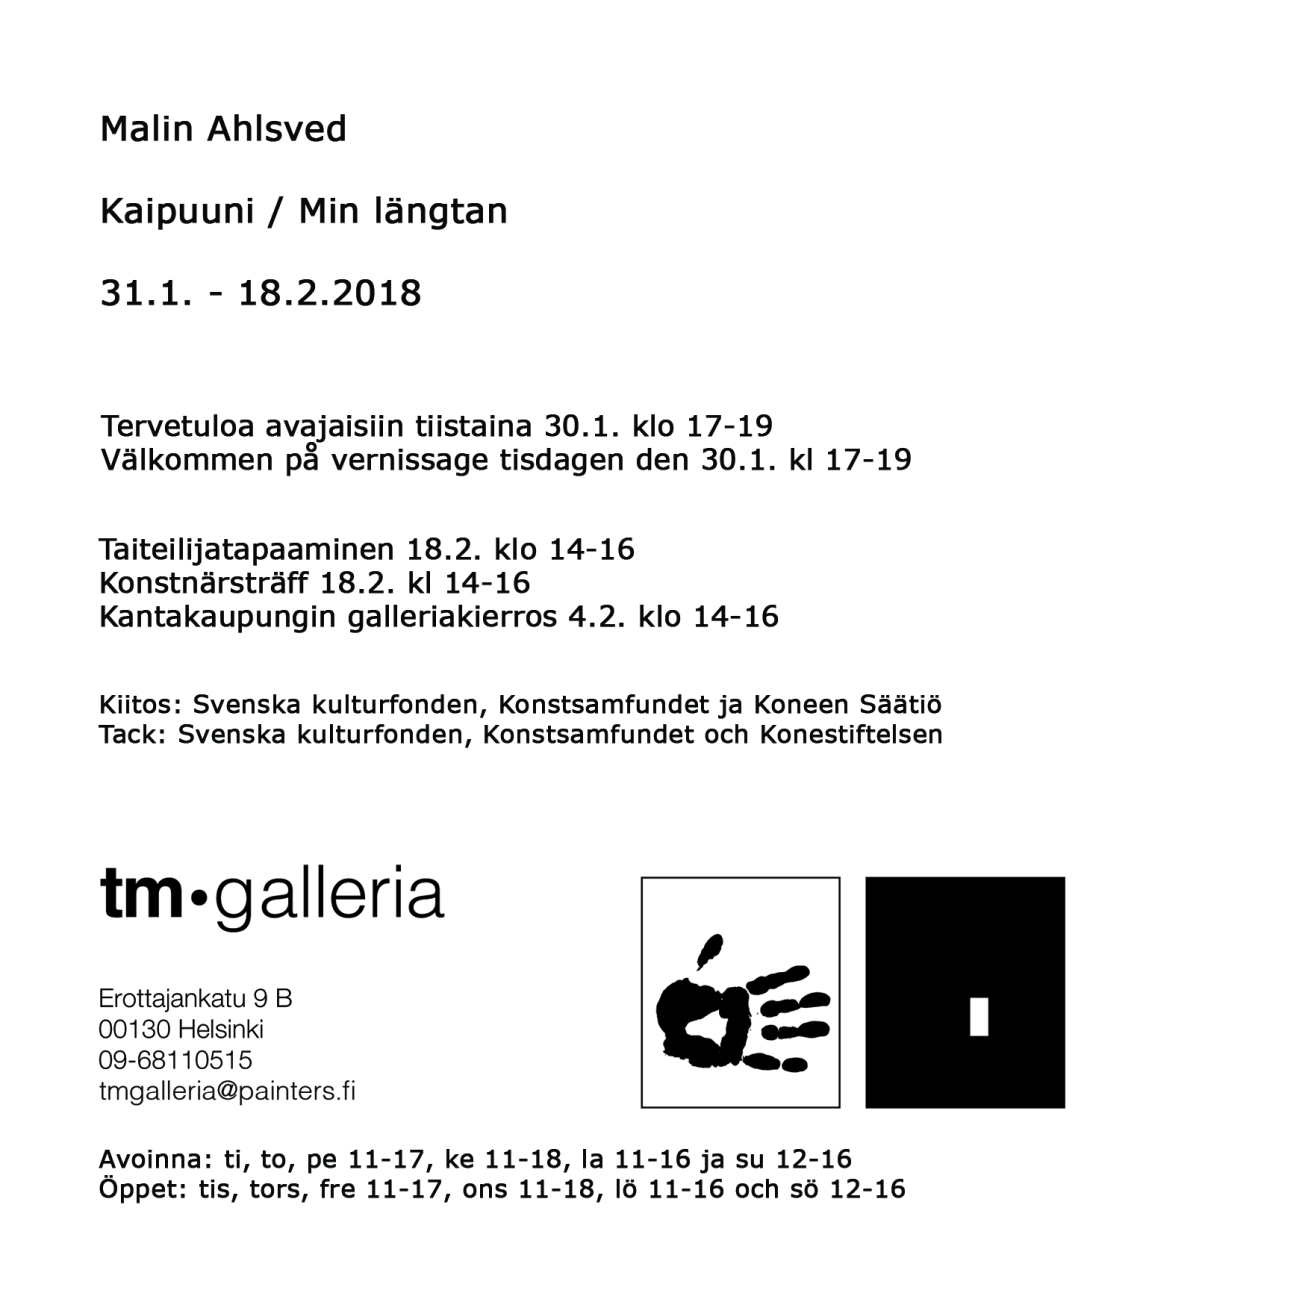 148x148,text